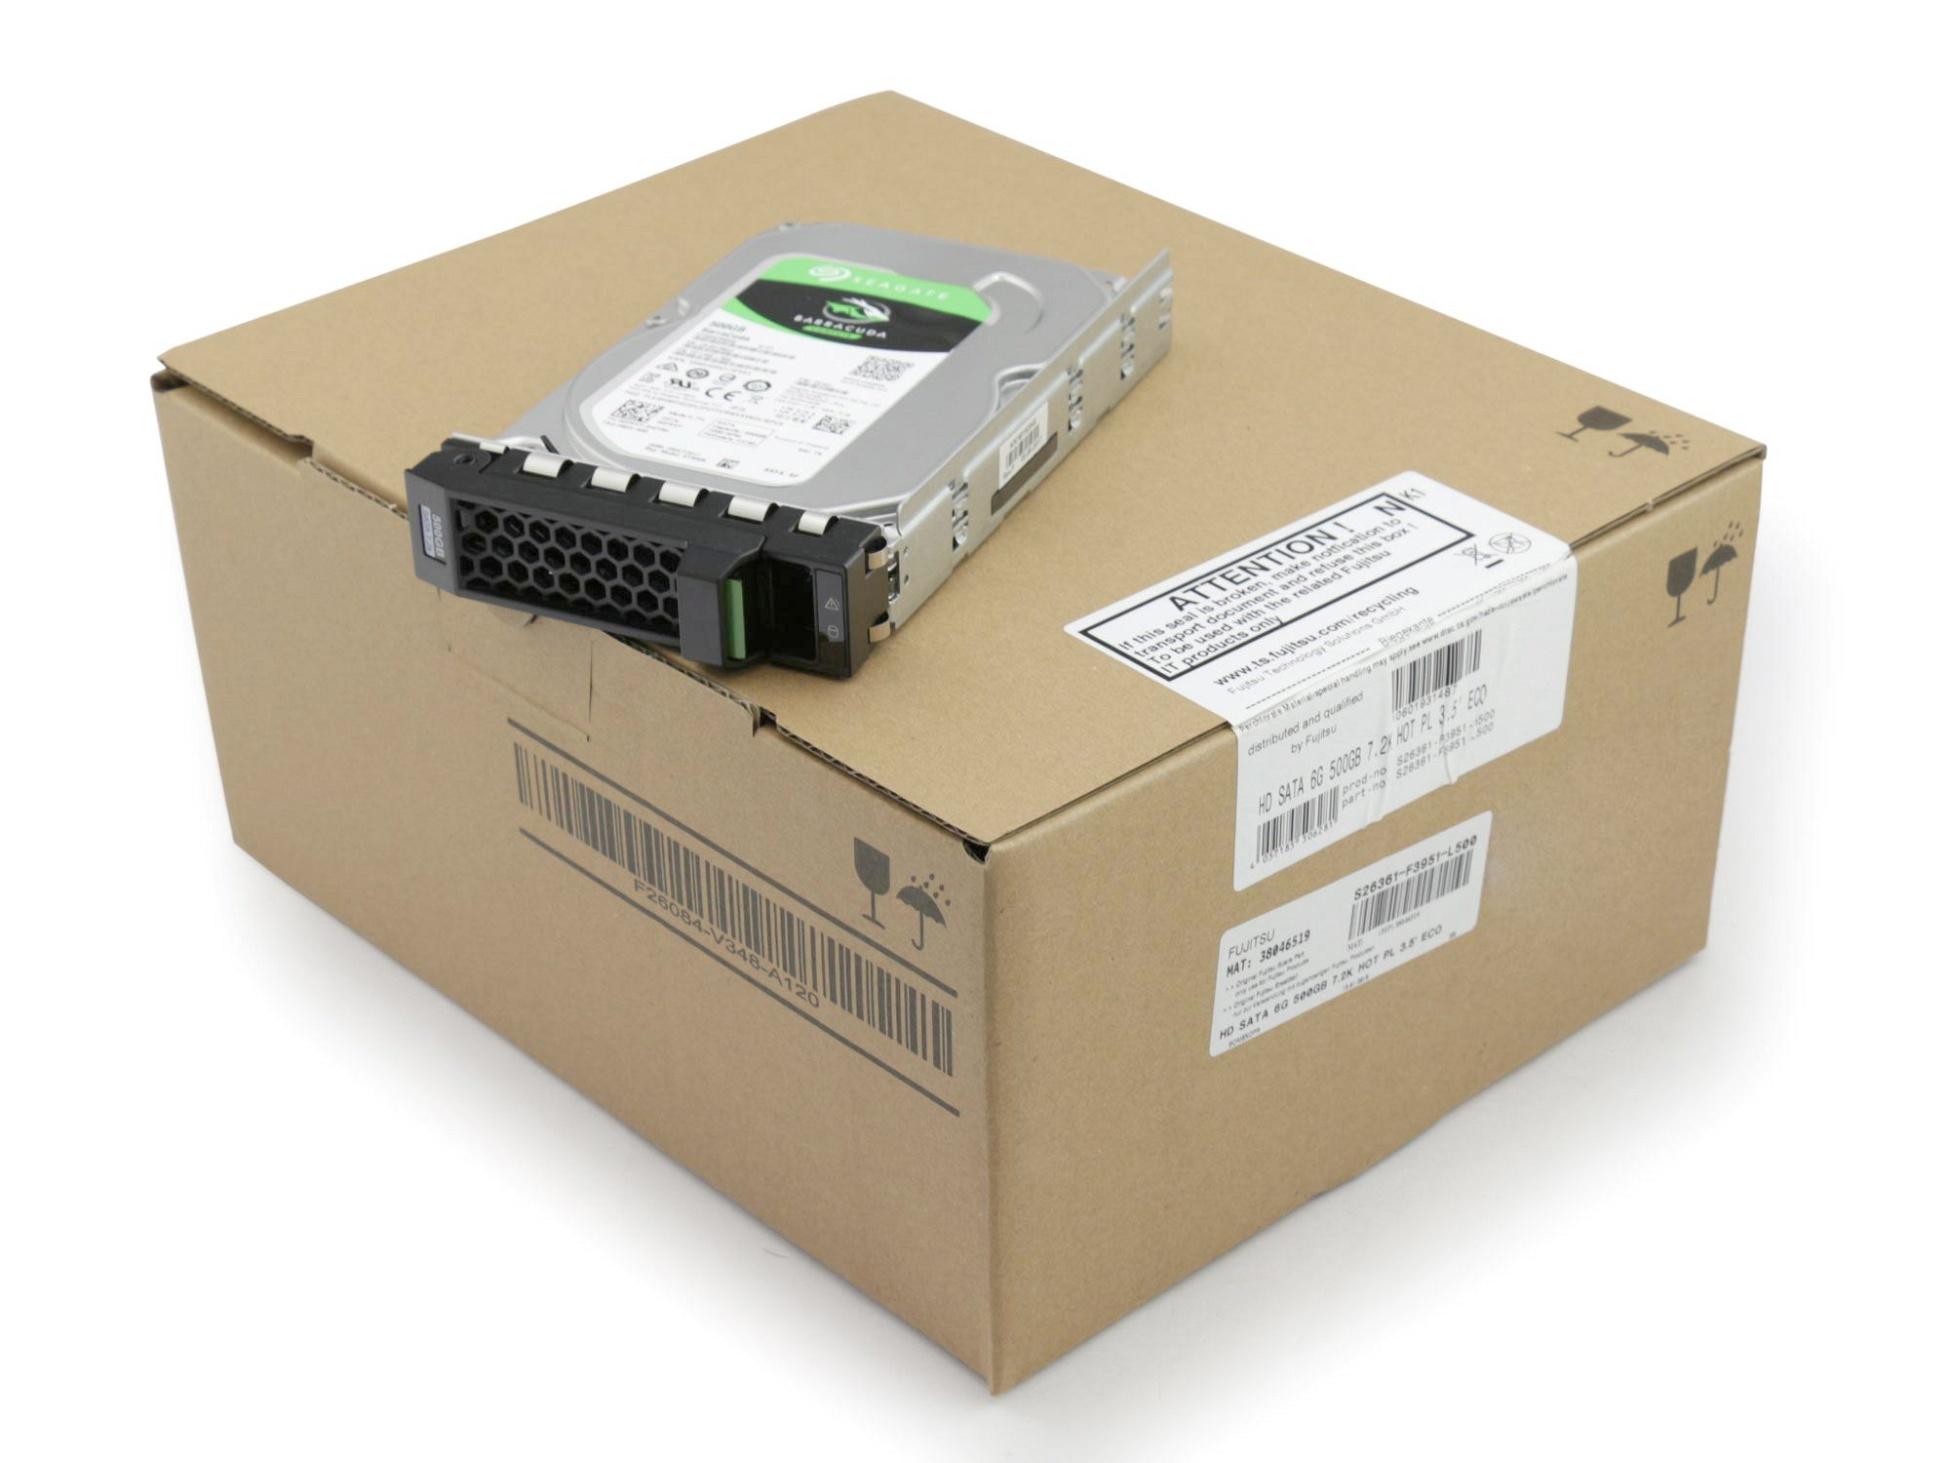 Fujitsu 38046519 Server Festplatte HDD 500GB (3,5 Zoll / 8,9 cm) S-ATA III (6,0 Gb/s) ECO 7.2K inkl. Hot-Plug